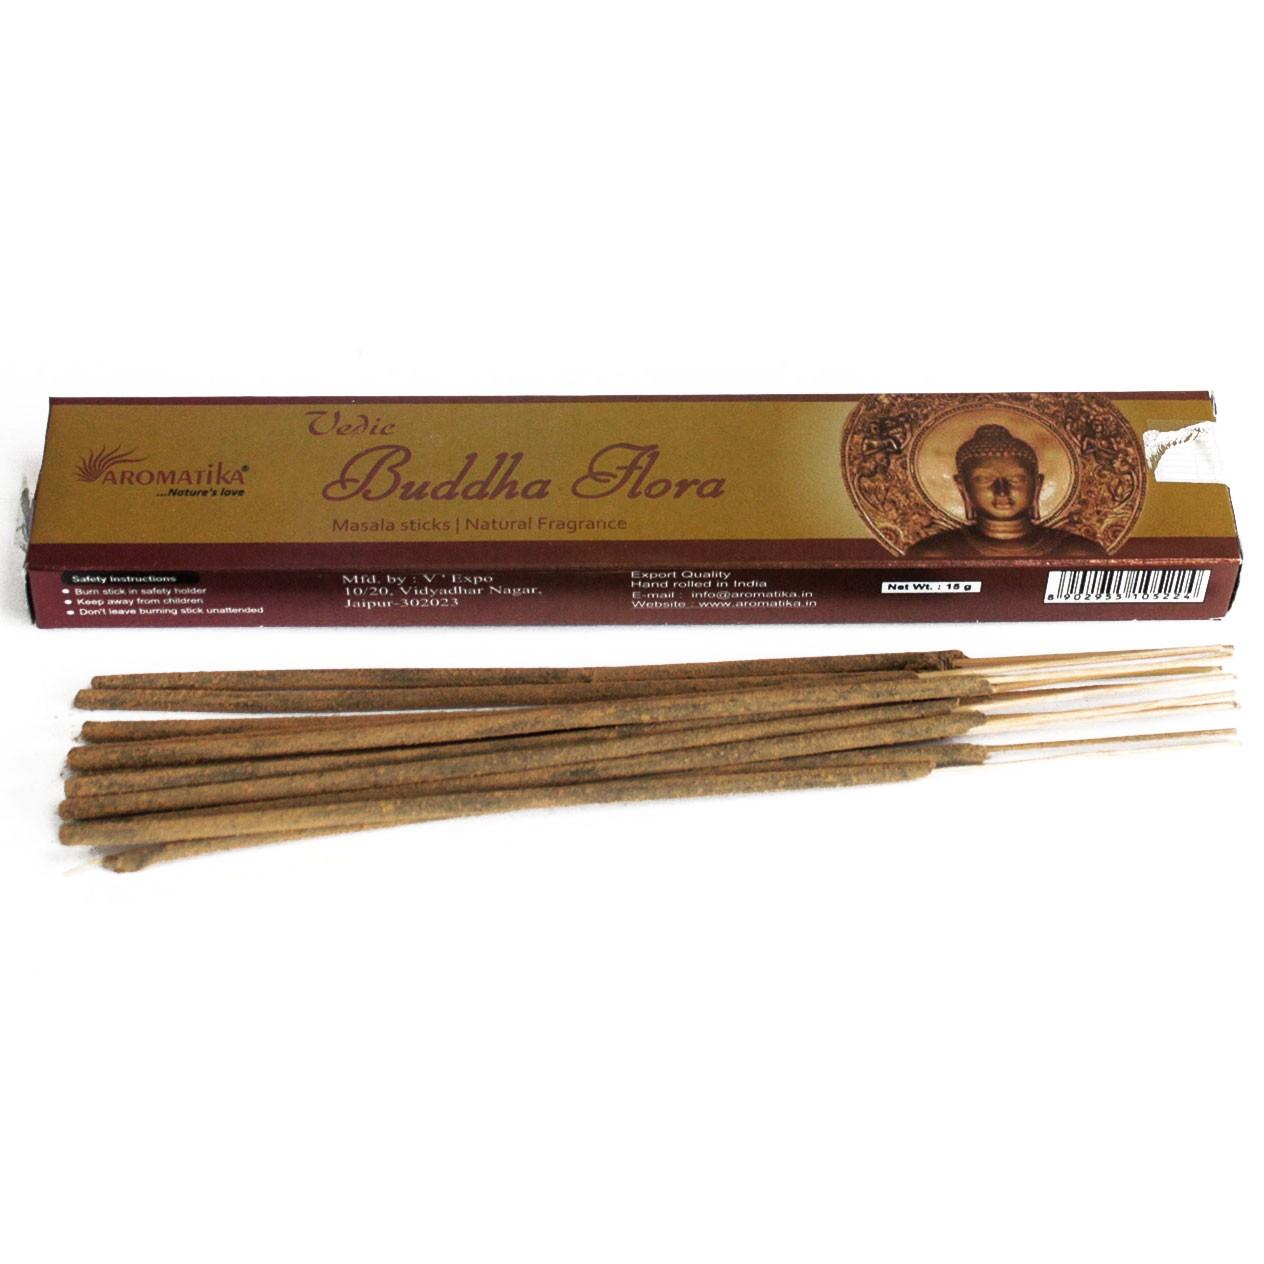 Vedic Incense Sticks Buddha Flora